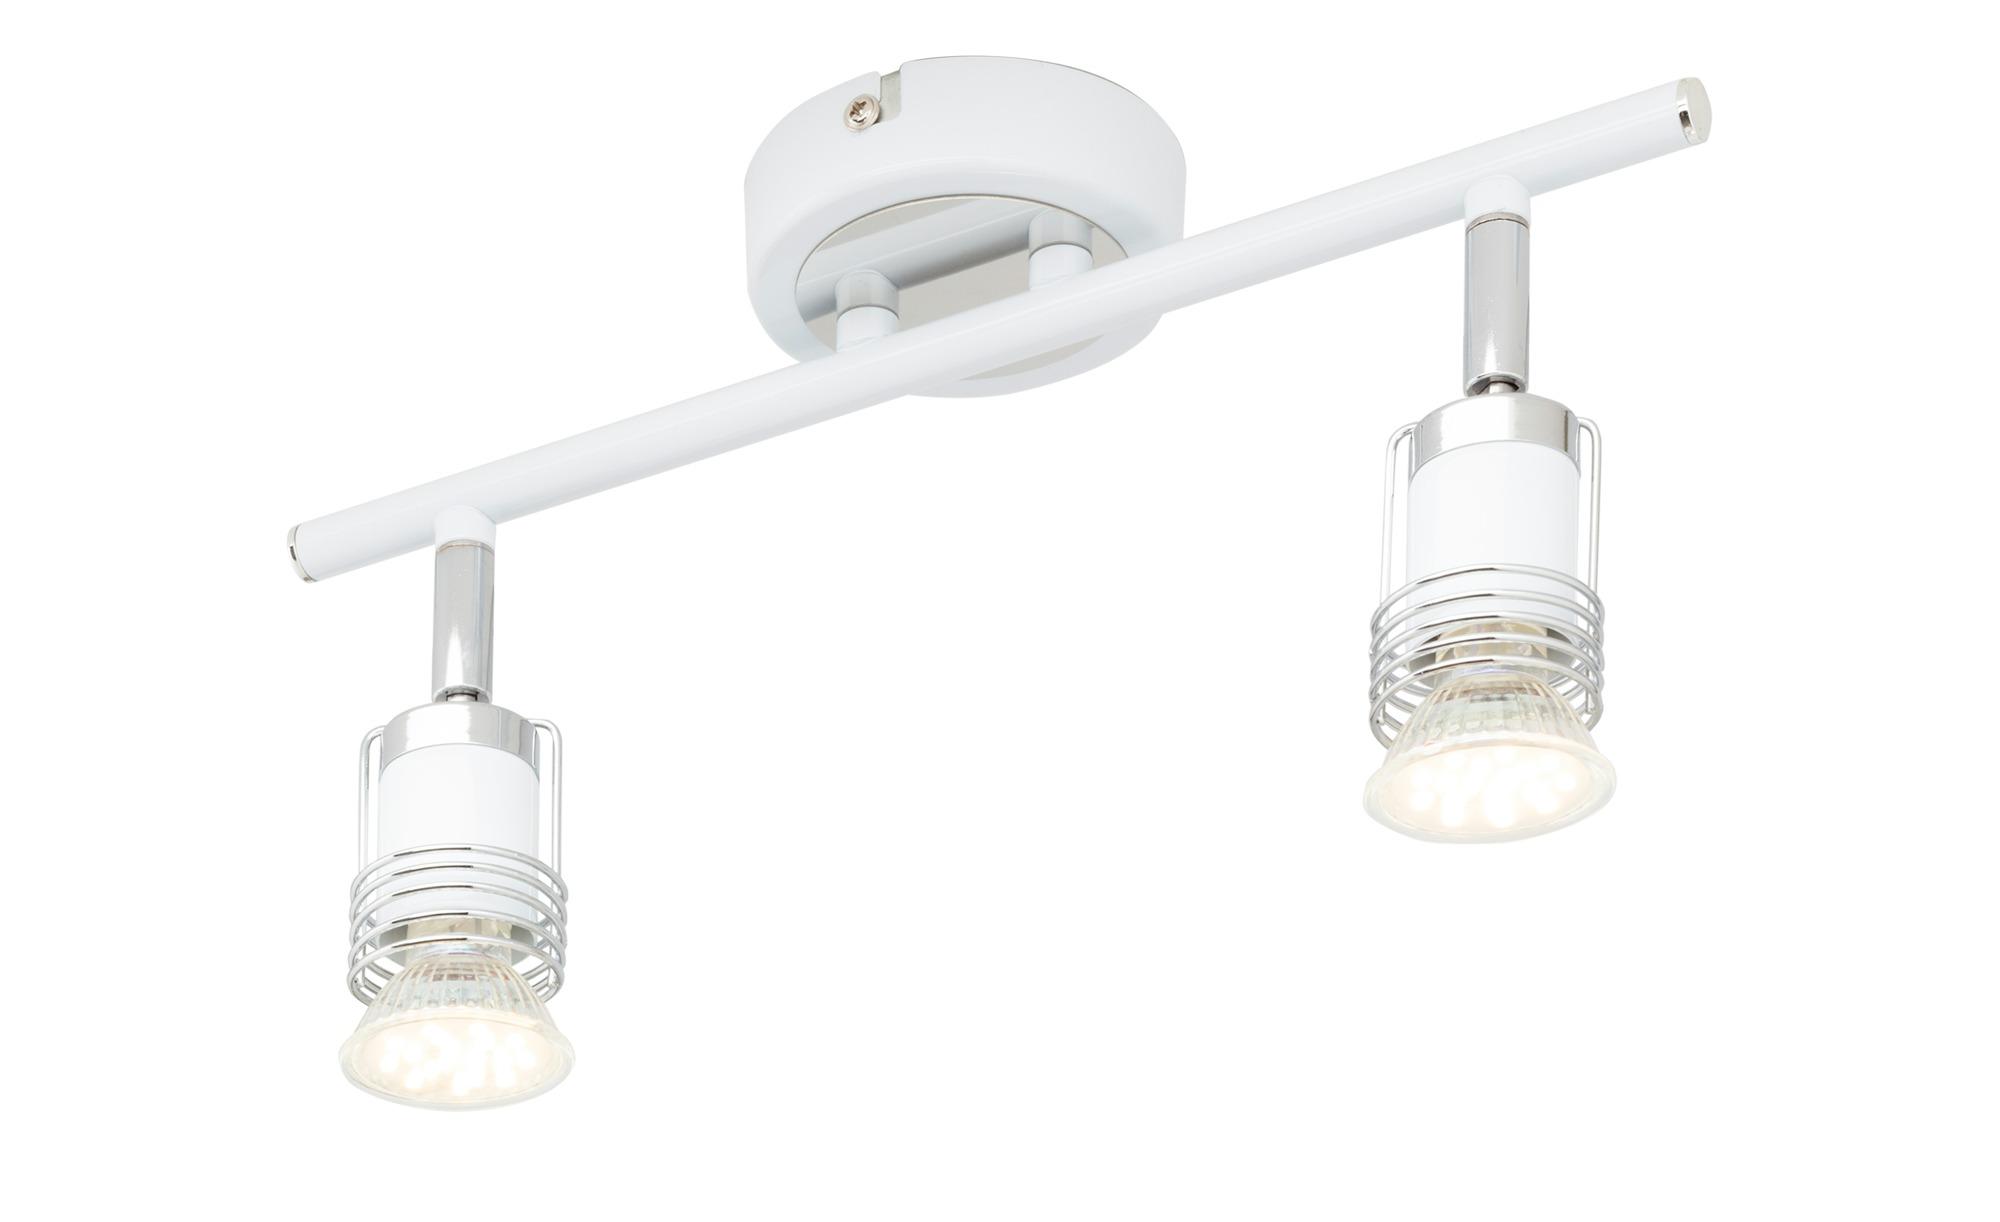 KHG LED-Deckenstrahler weiß mit 2 Spots ¦ weiß ¦ Maße (cm): B: 18 H: 17,4 Lampen & Leuchten > LED-Leuchten > LED-Strahler & Spots - Höffner